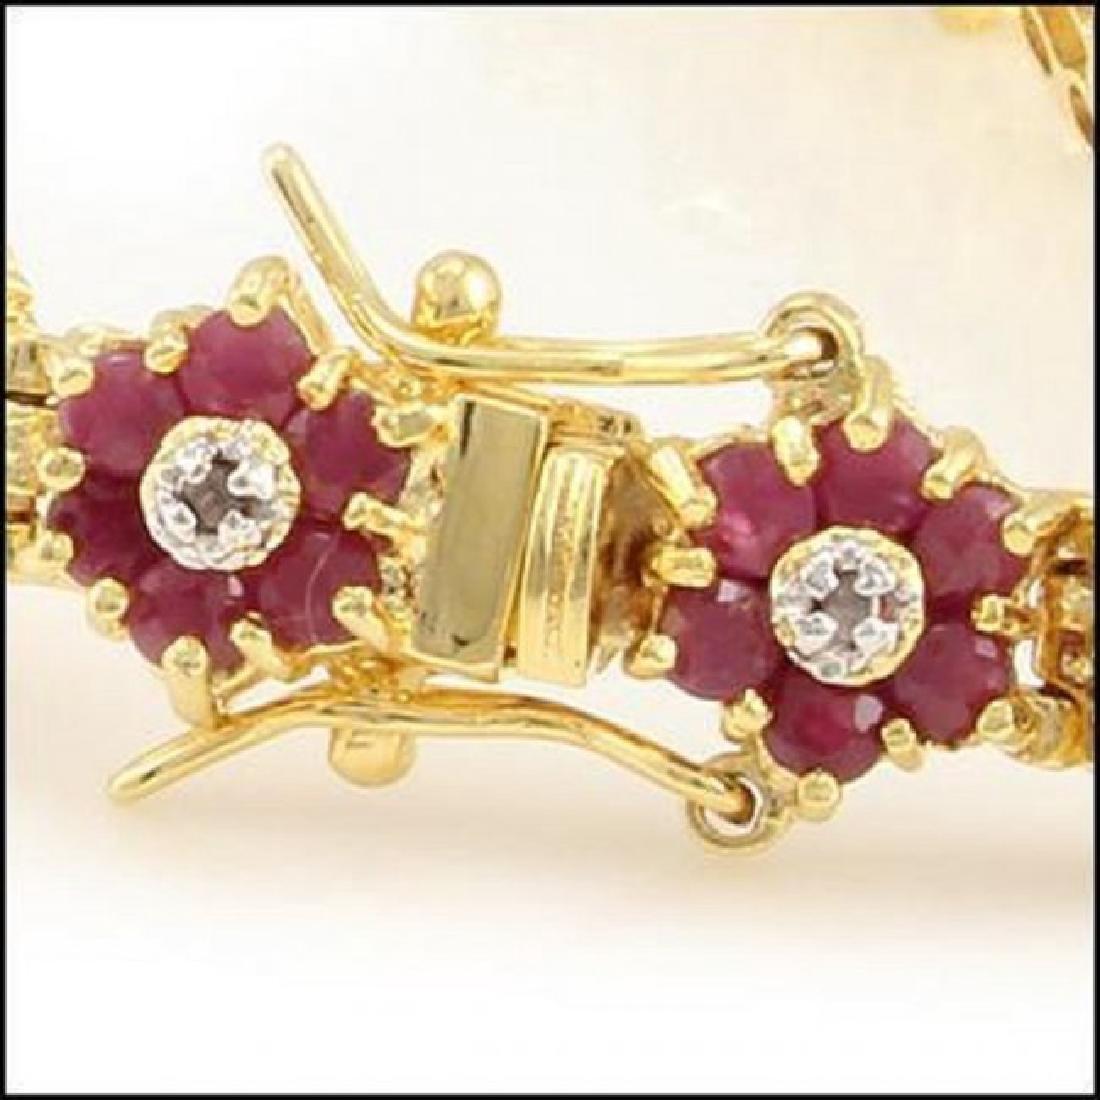 16.74 Ct Ruby & Diamond Designer Bracelet - 2